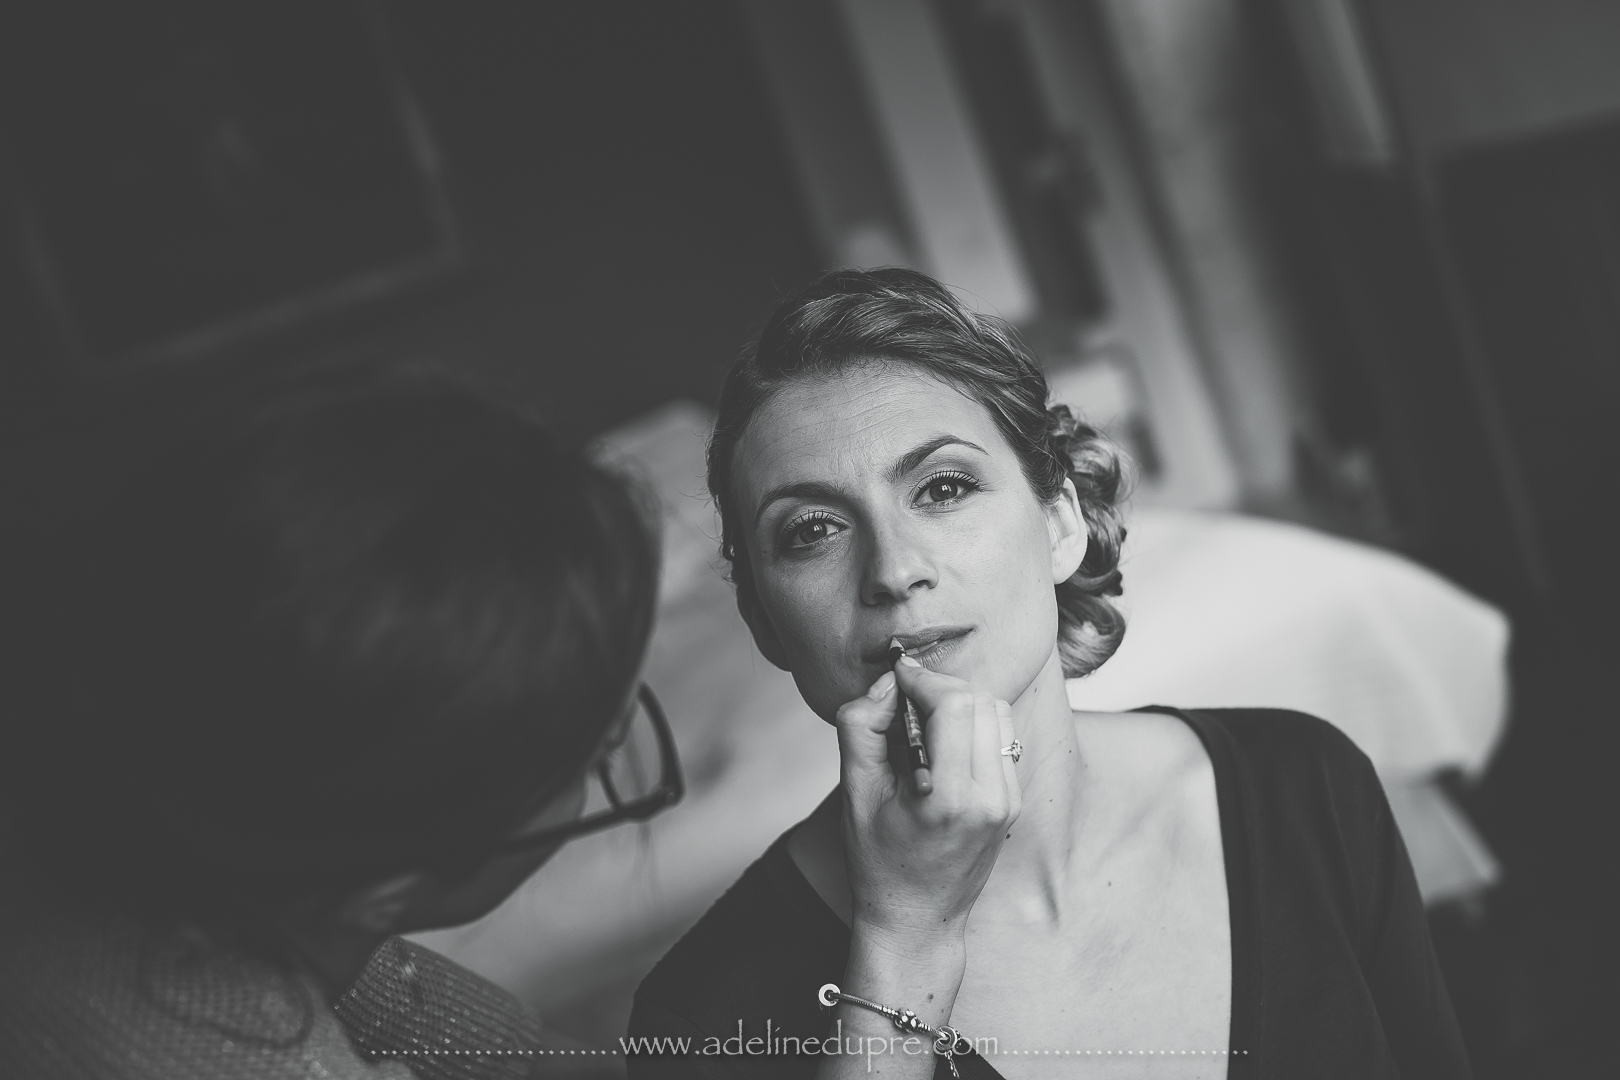 Adeline Dupre Photographe-1270